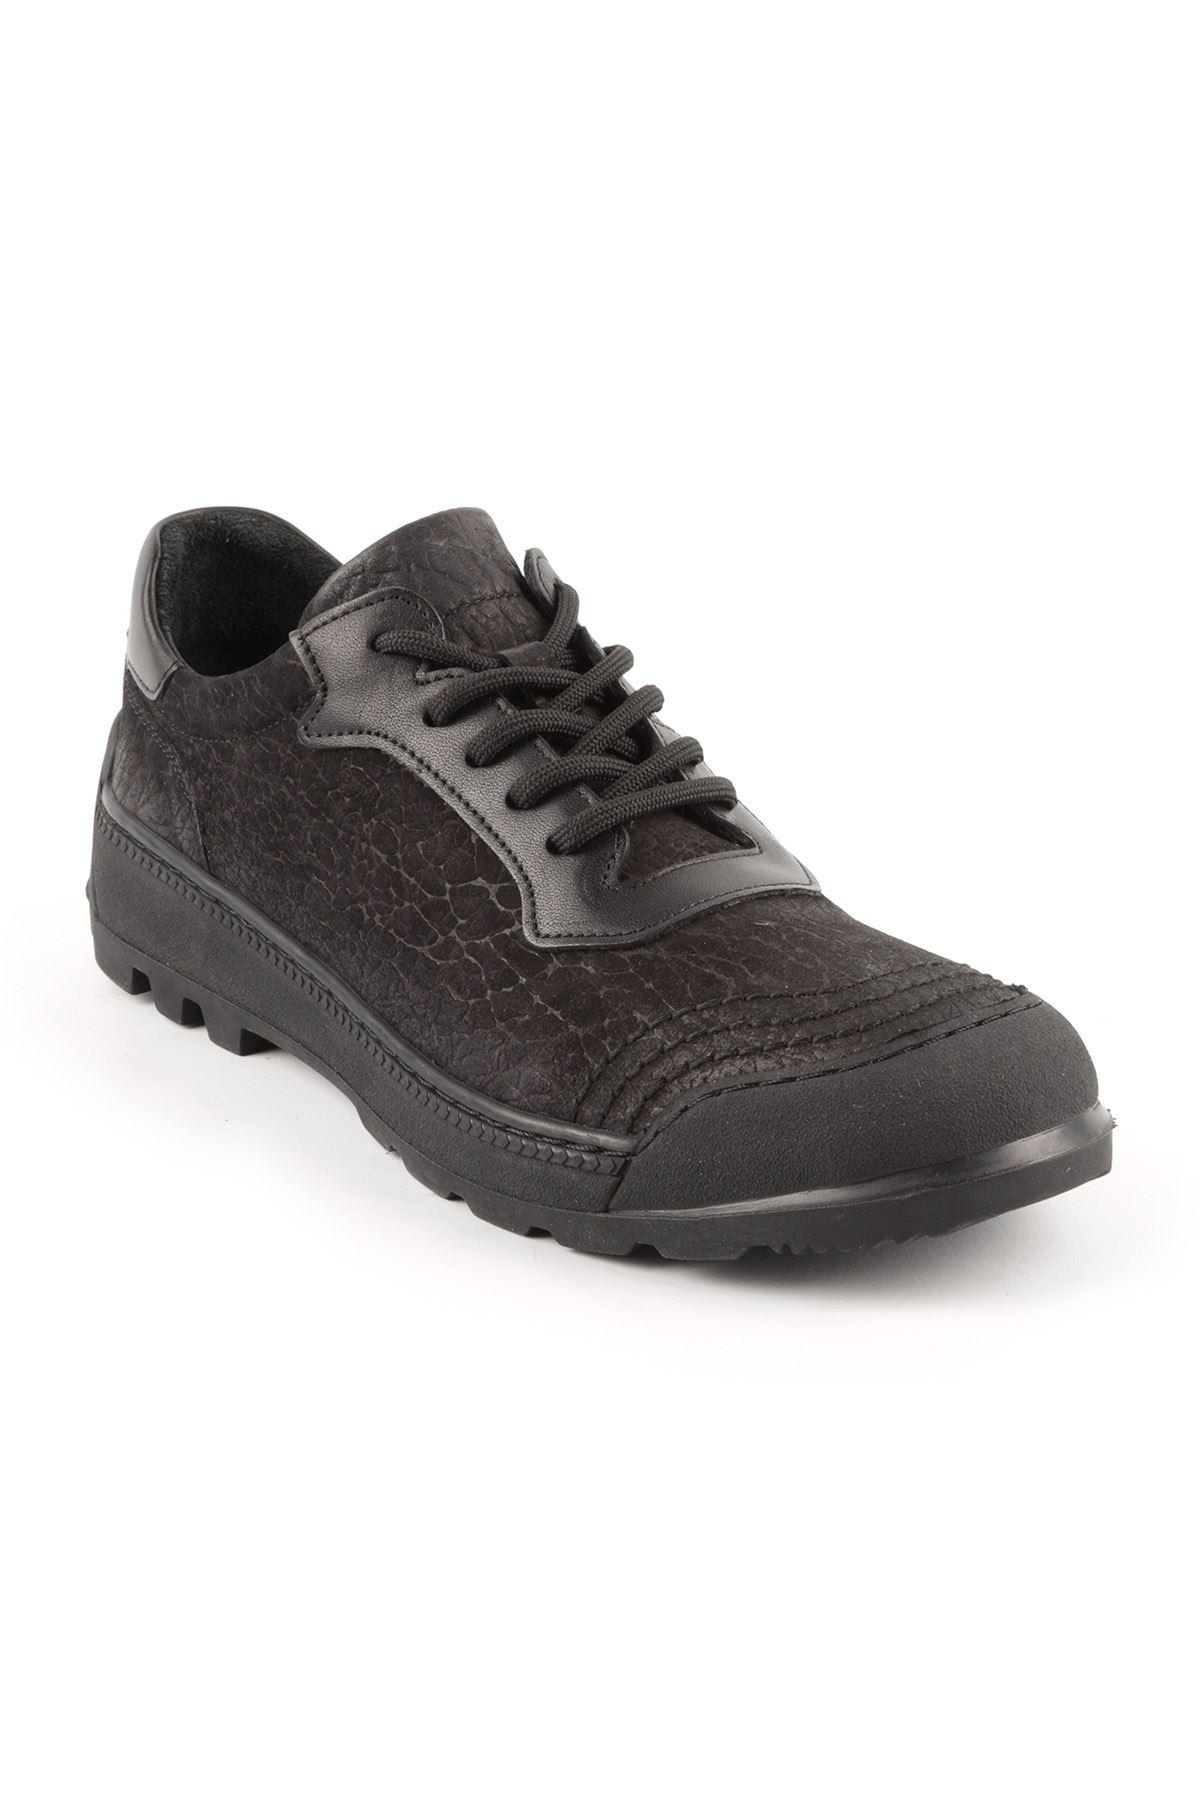 Libero L3178 EA Siyah Erkek Ayakkabı